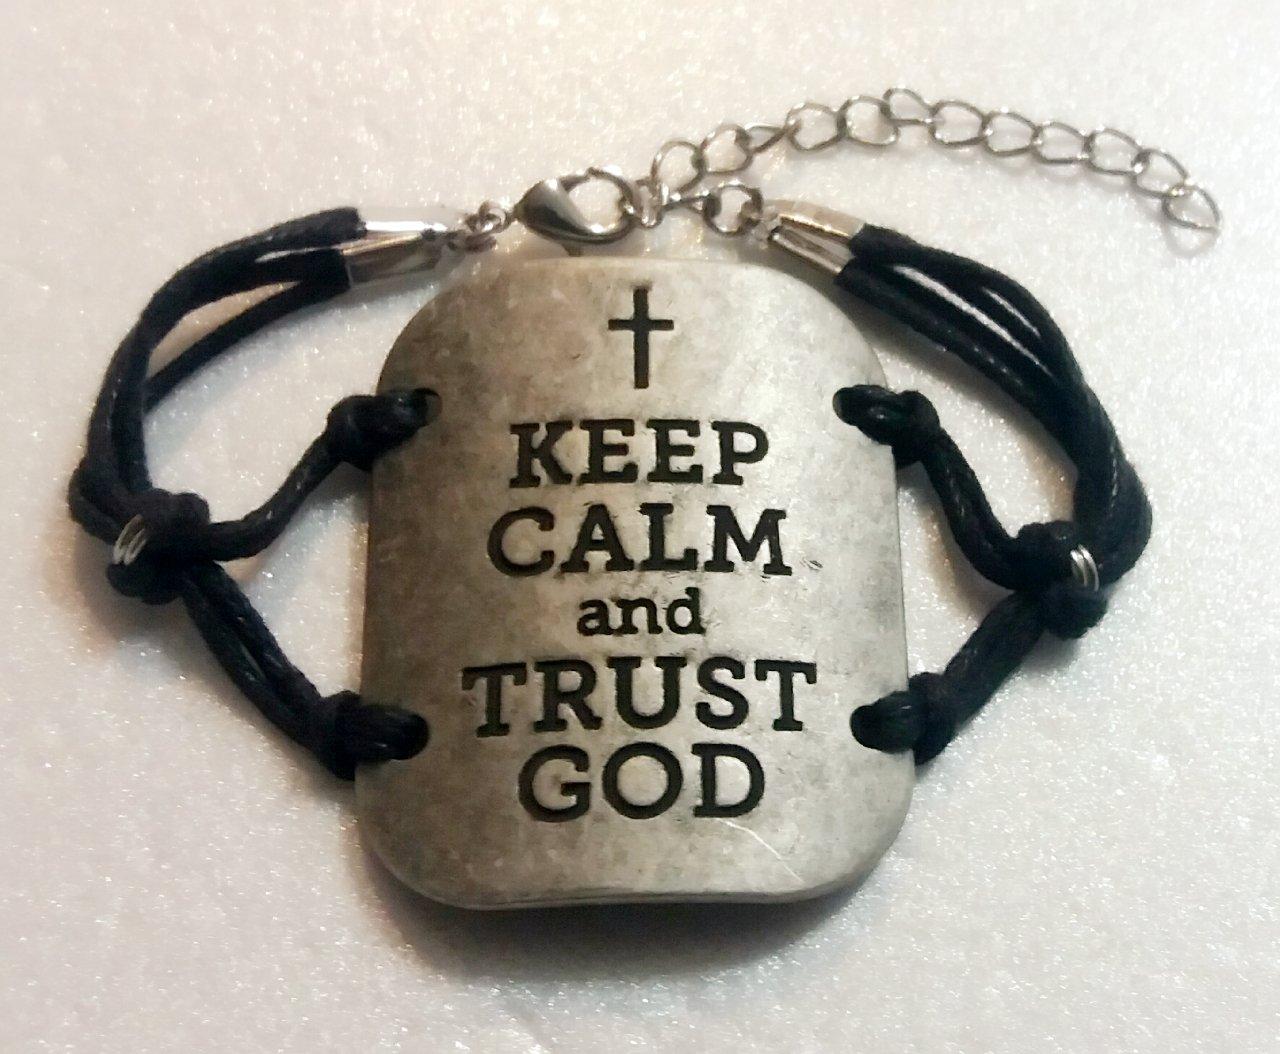 KEEP CALM AND TRUST GOD ADJUSTABLE HANDMADE BRACELET (BLACK)